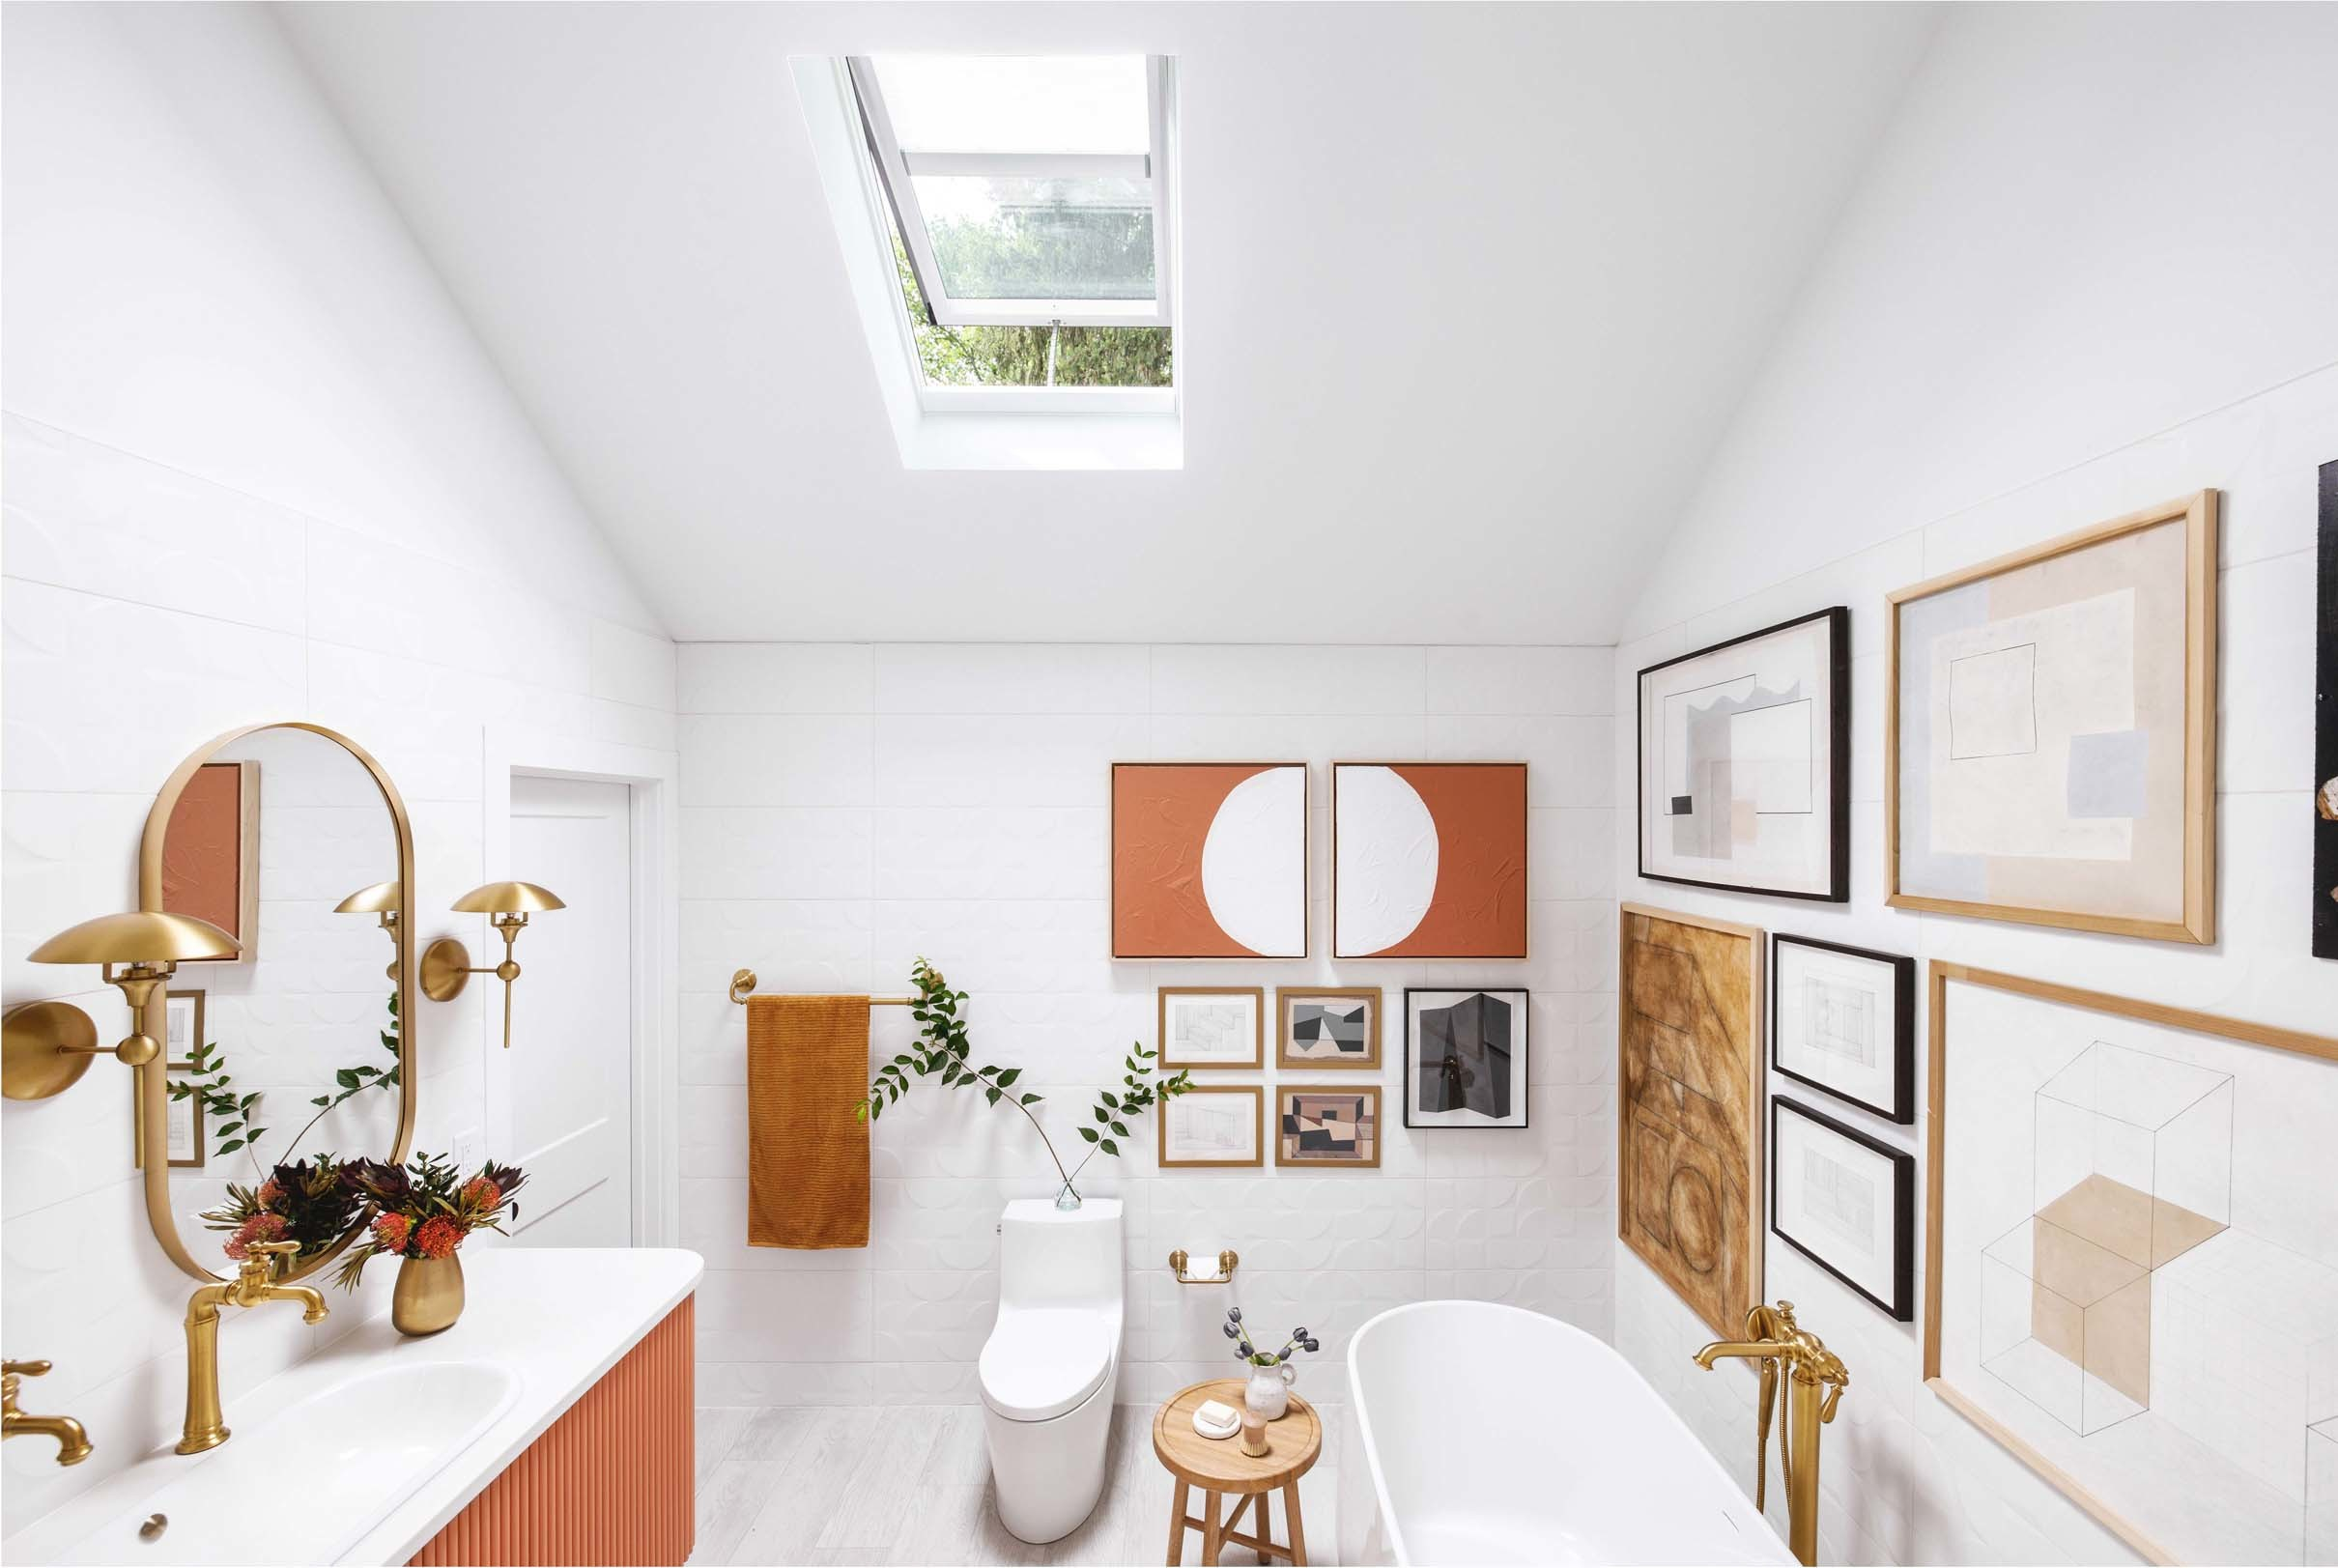 Bathroom skylight terrcotta floating vanity